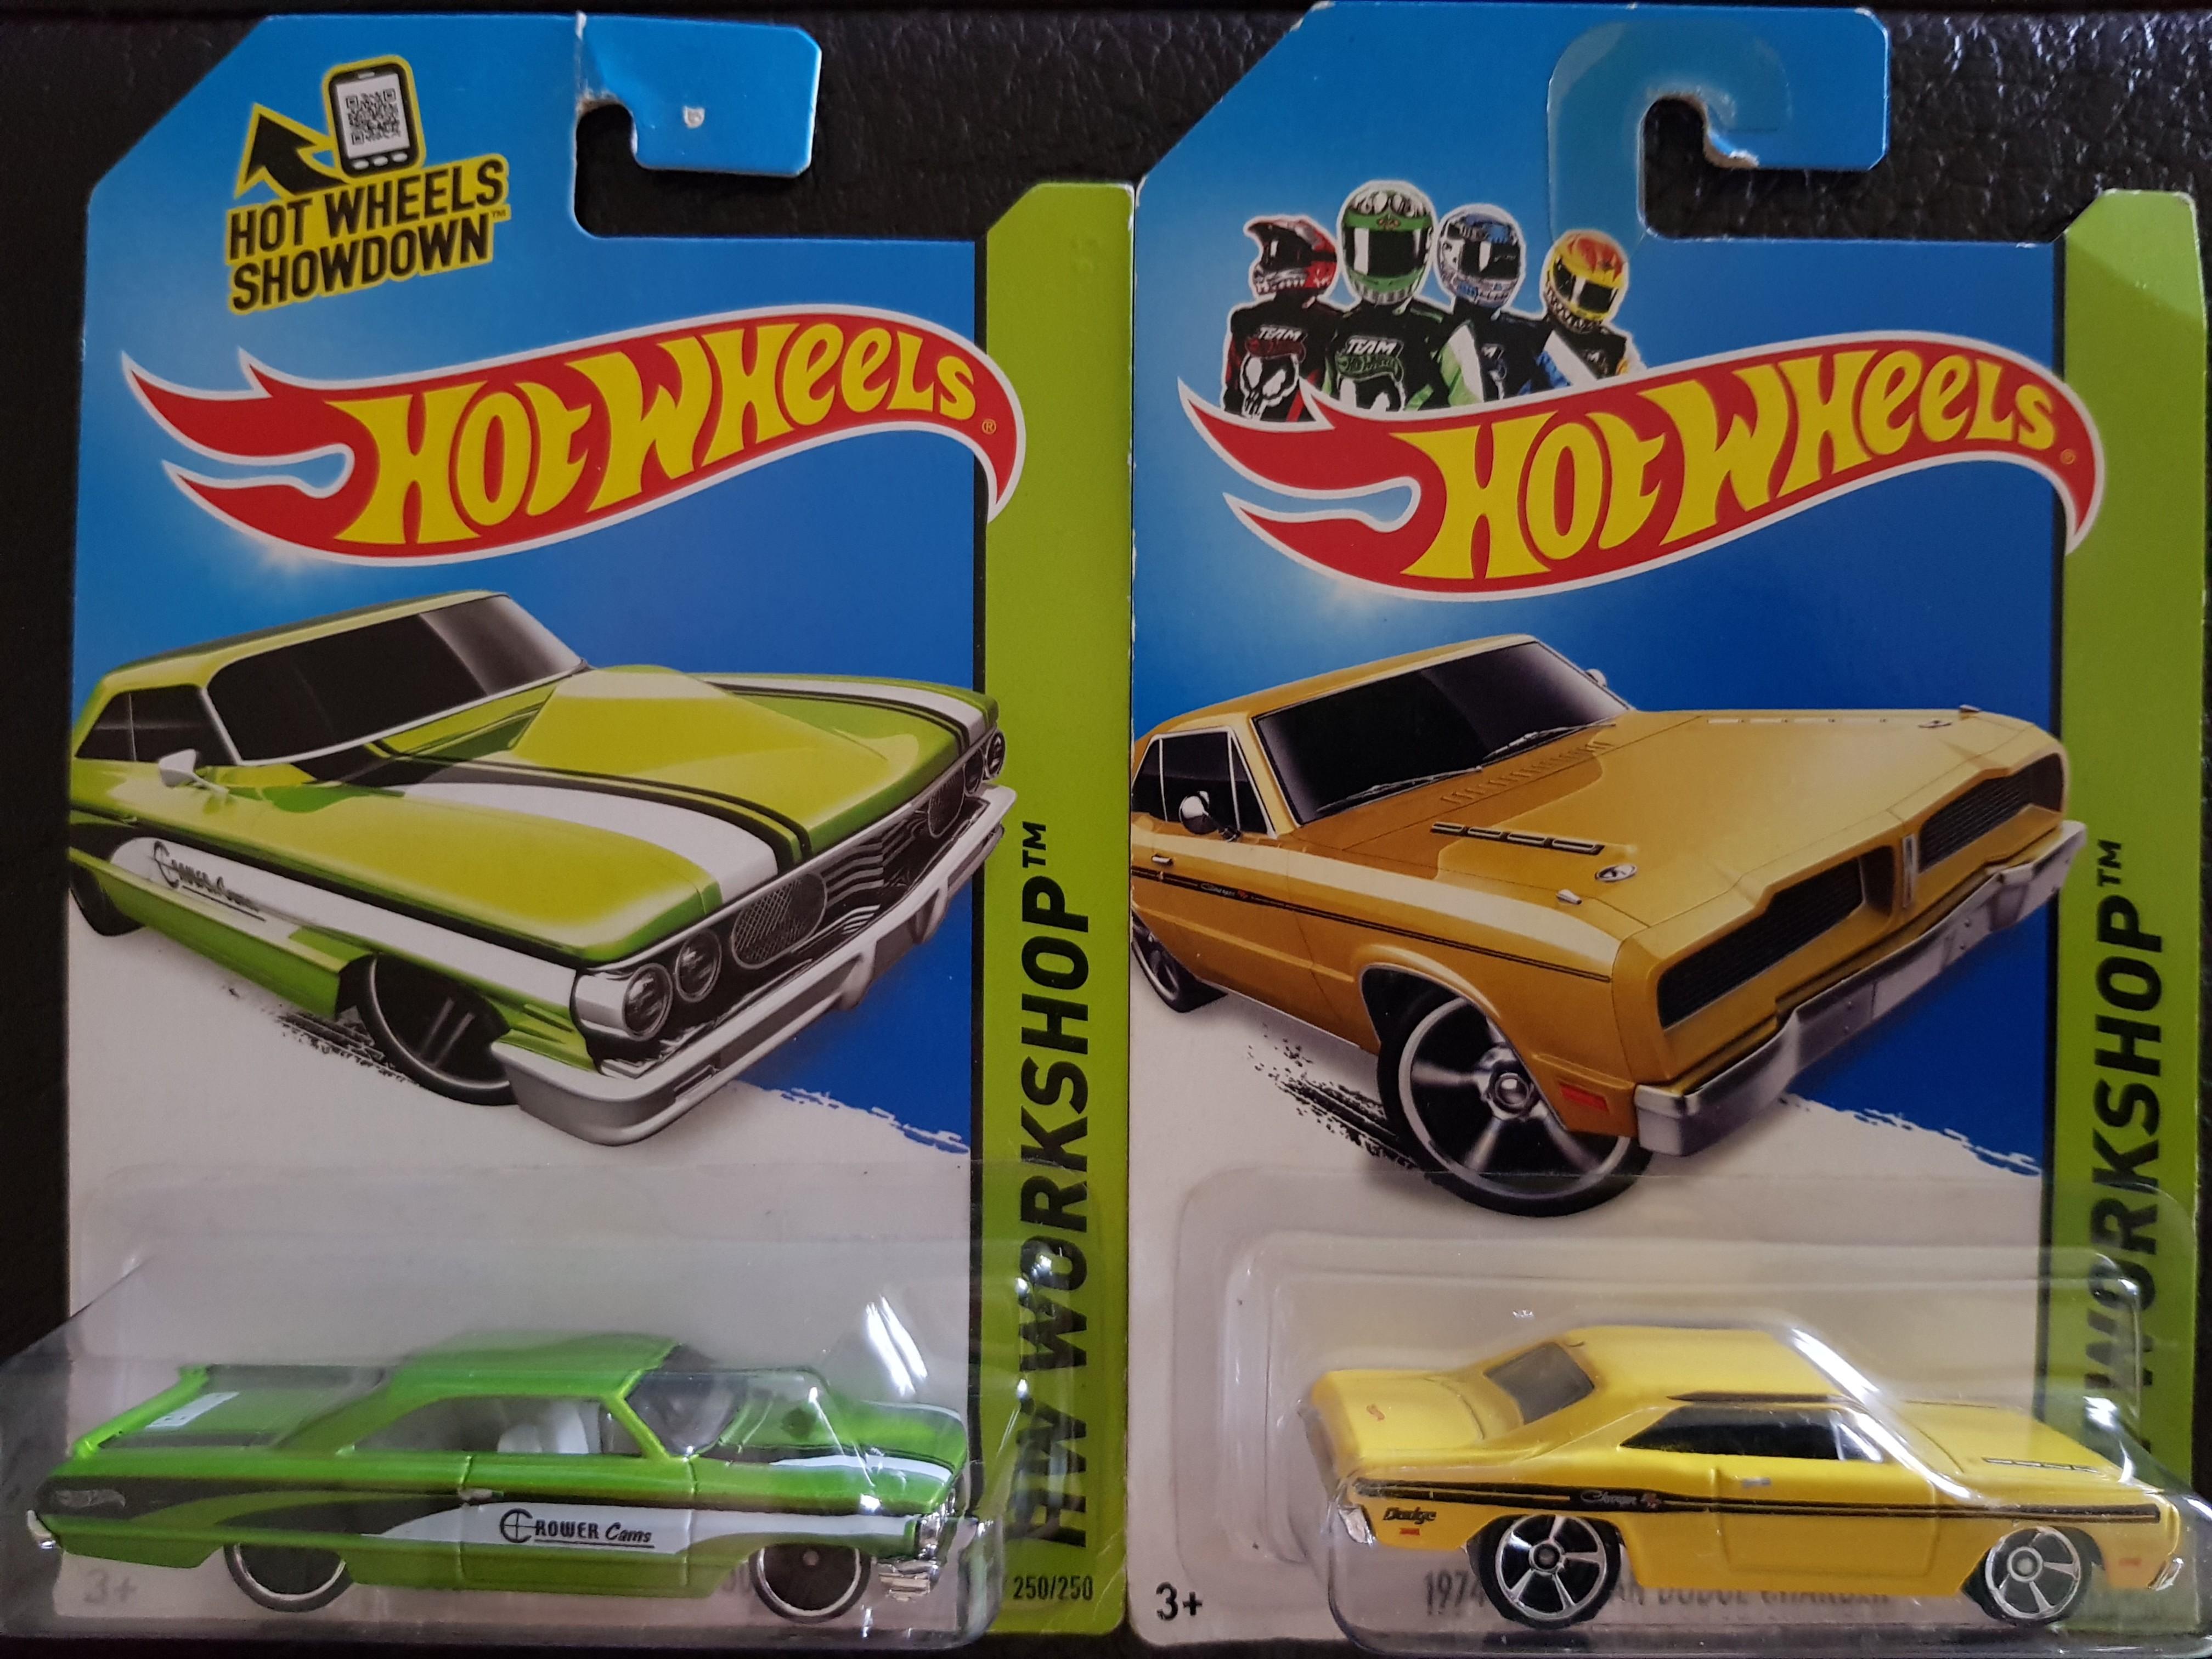 Rare Hotwheels Ford Galaxie, Dodge Charger sale! Hot wheels